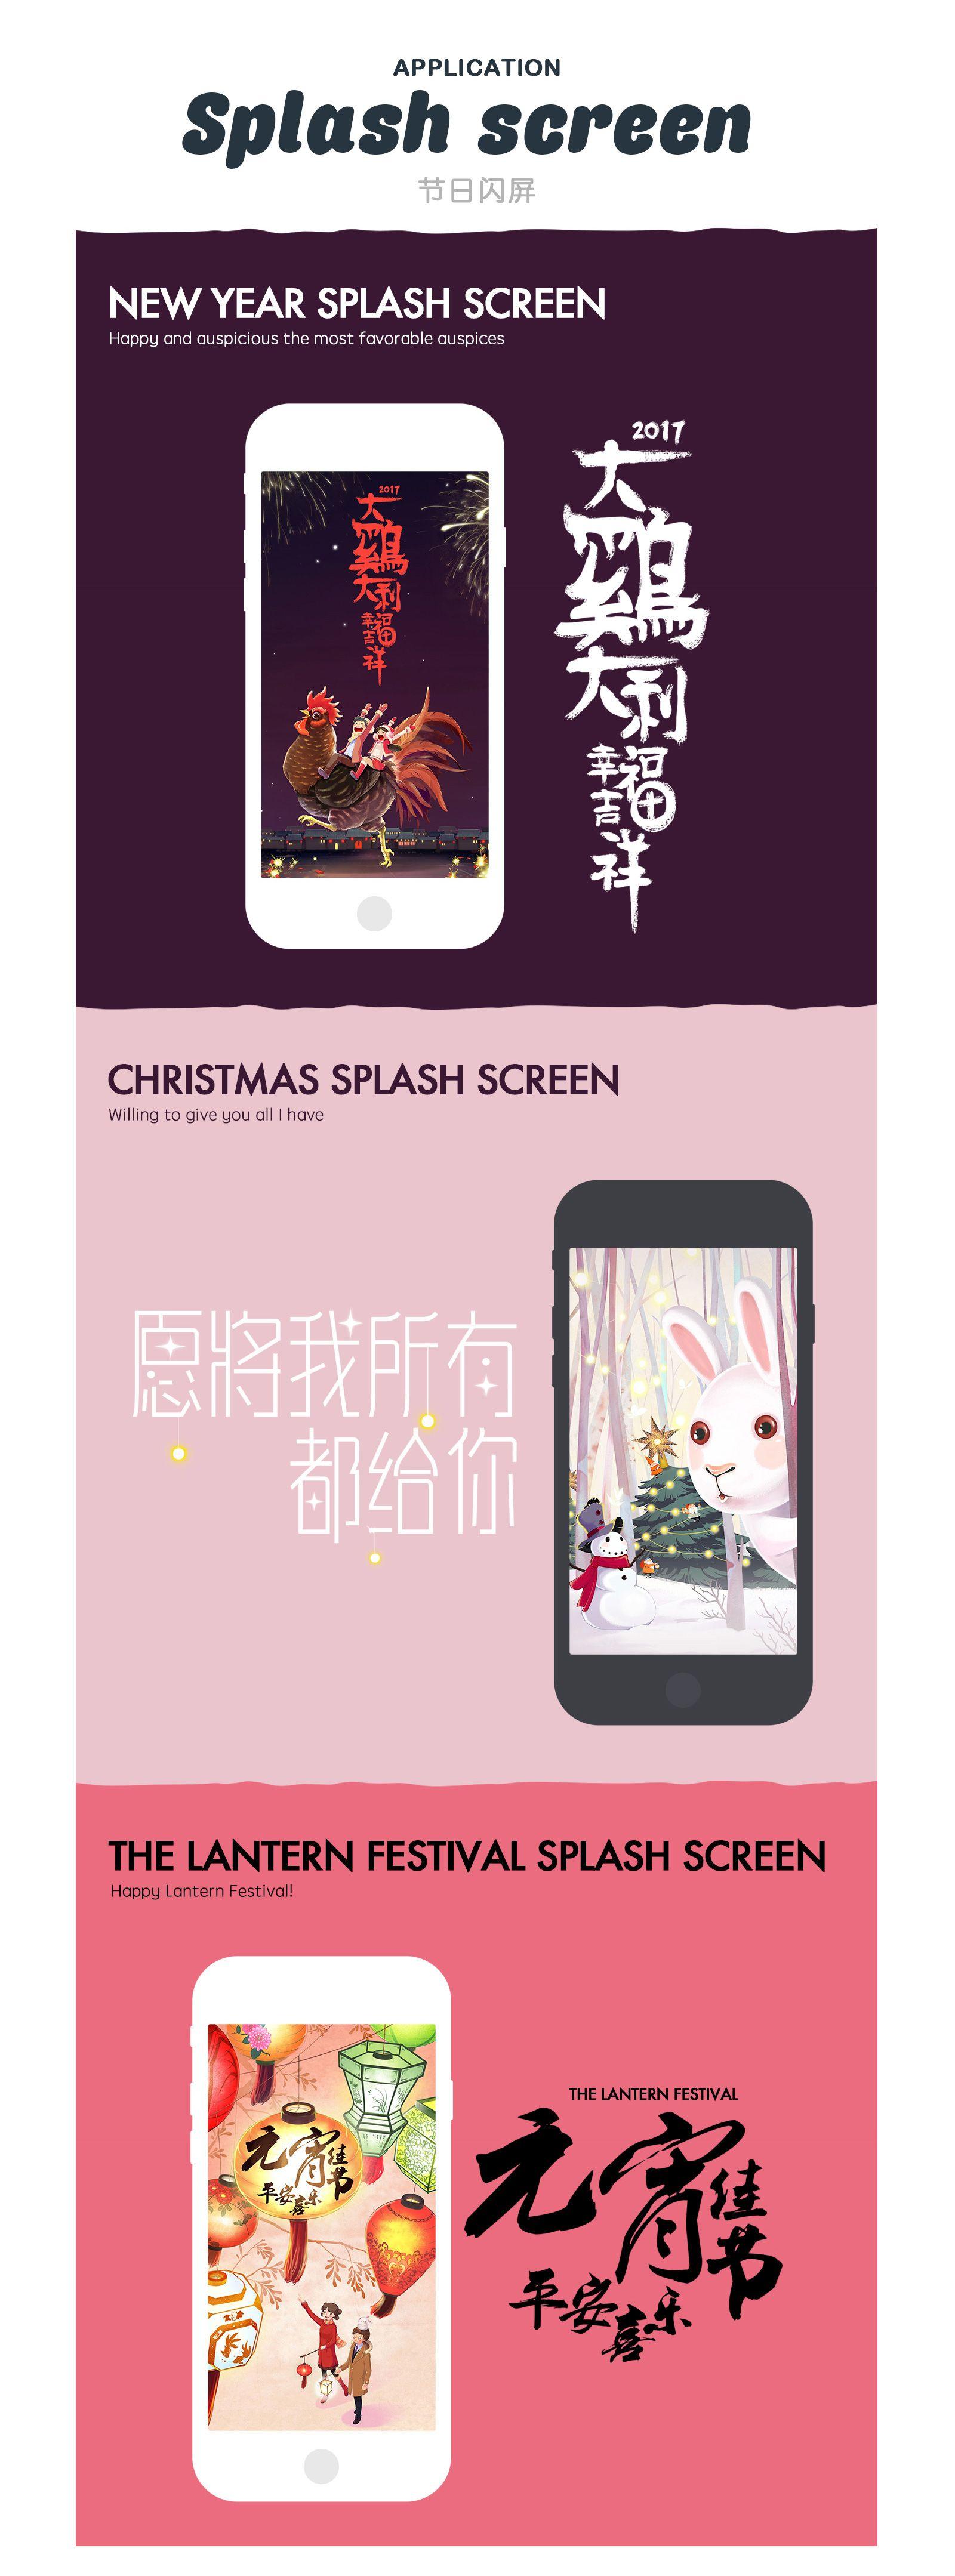 Behance 搜索 Splash screen, Happy year, Lantern festival